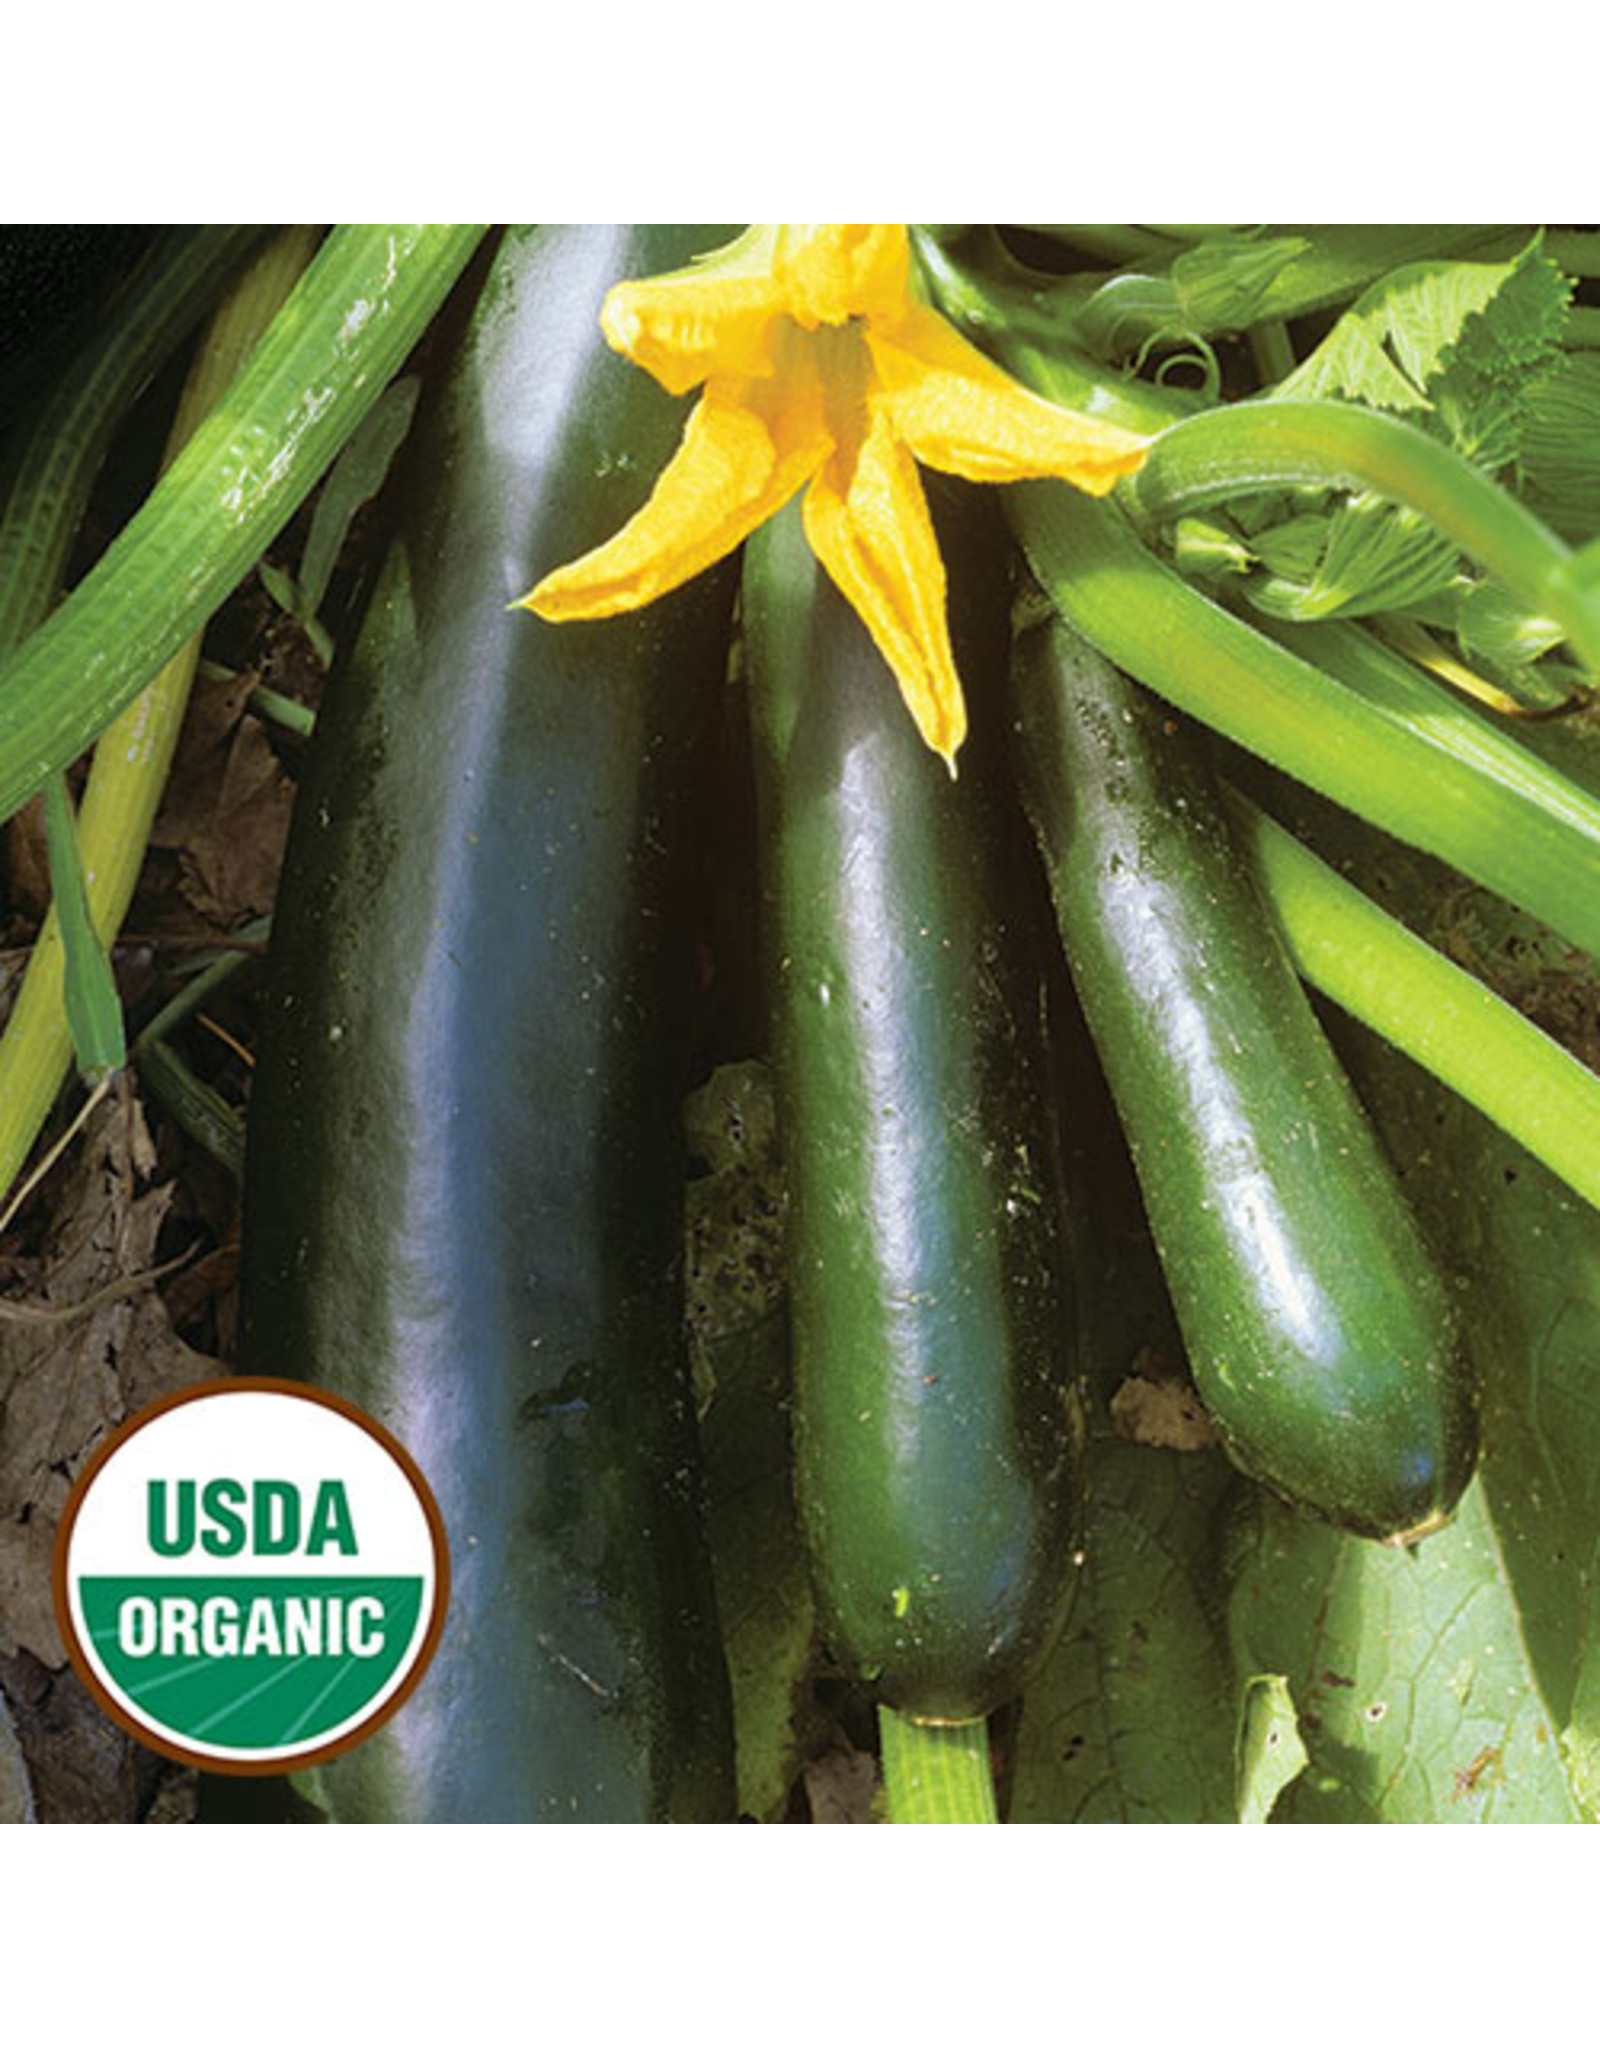 Seed Savers Squash - Black Beauty Zucchini